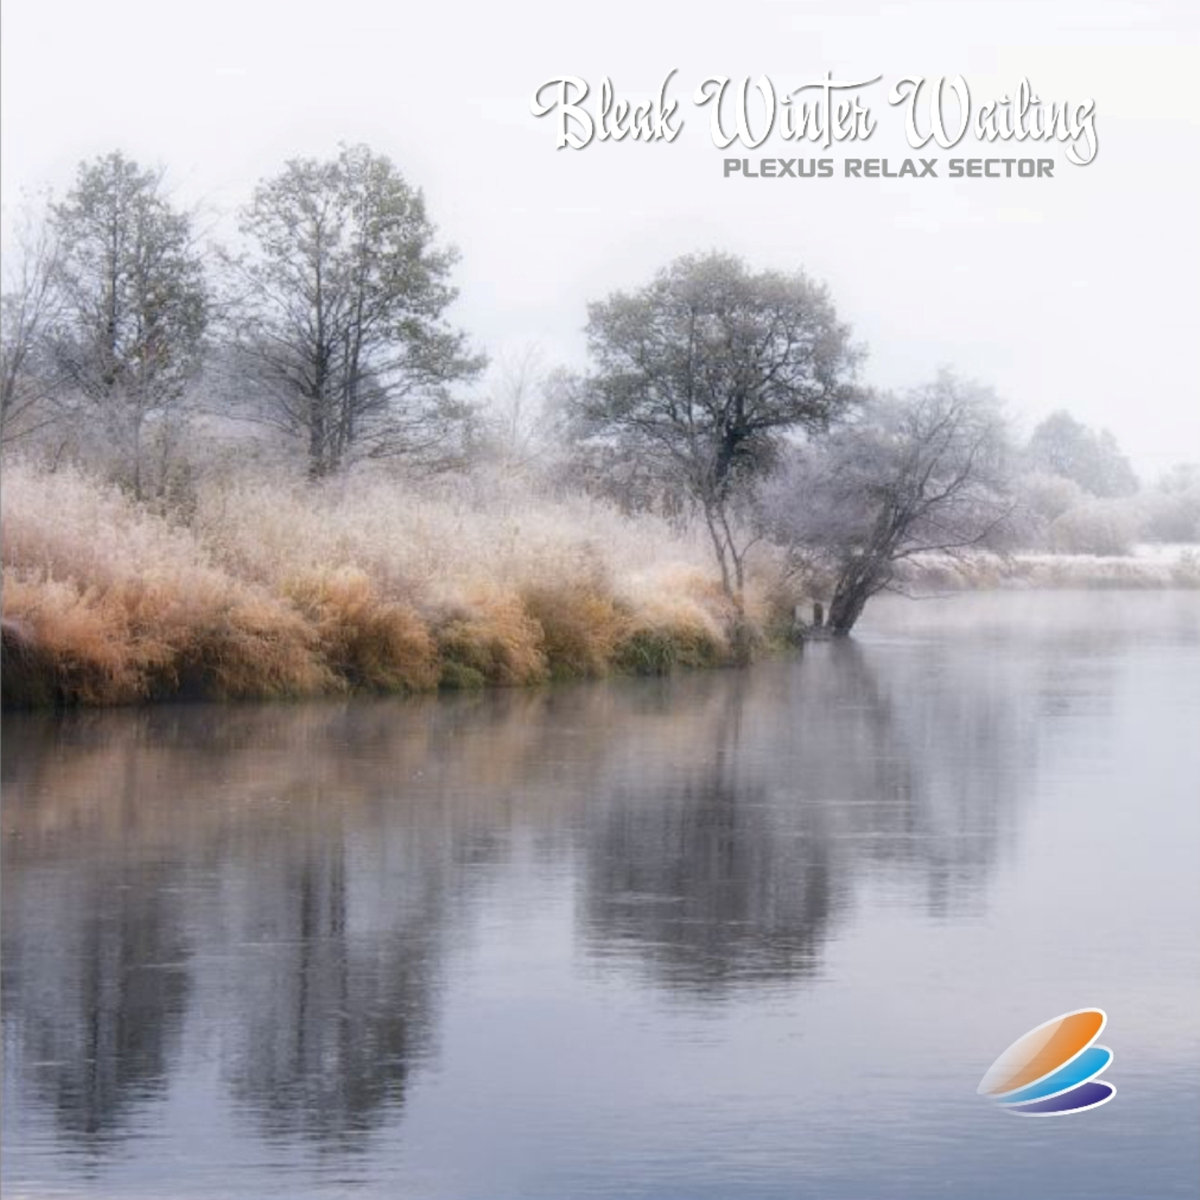 Plexus Relax Sector - Bleak Winter Wailing